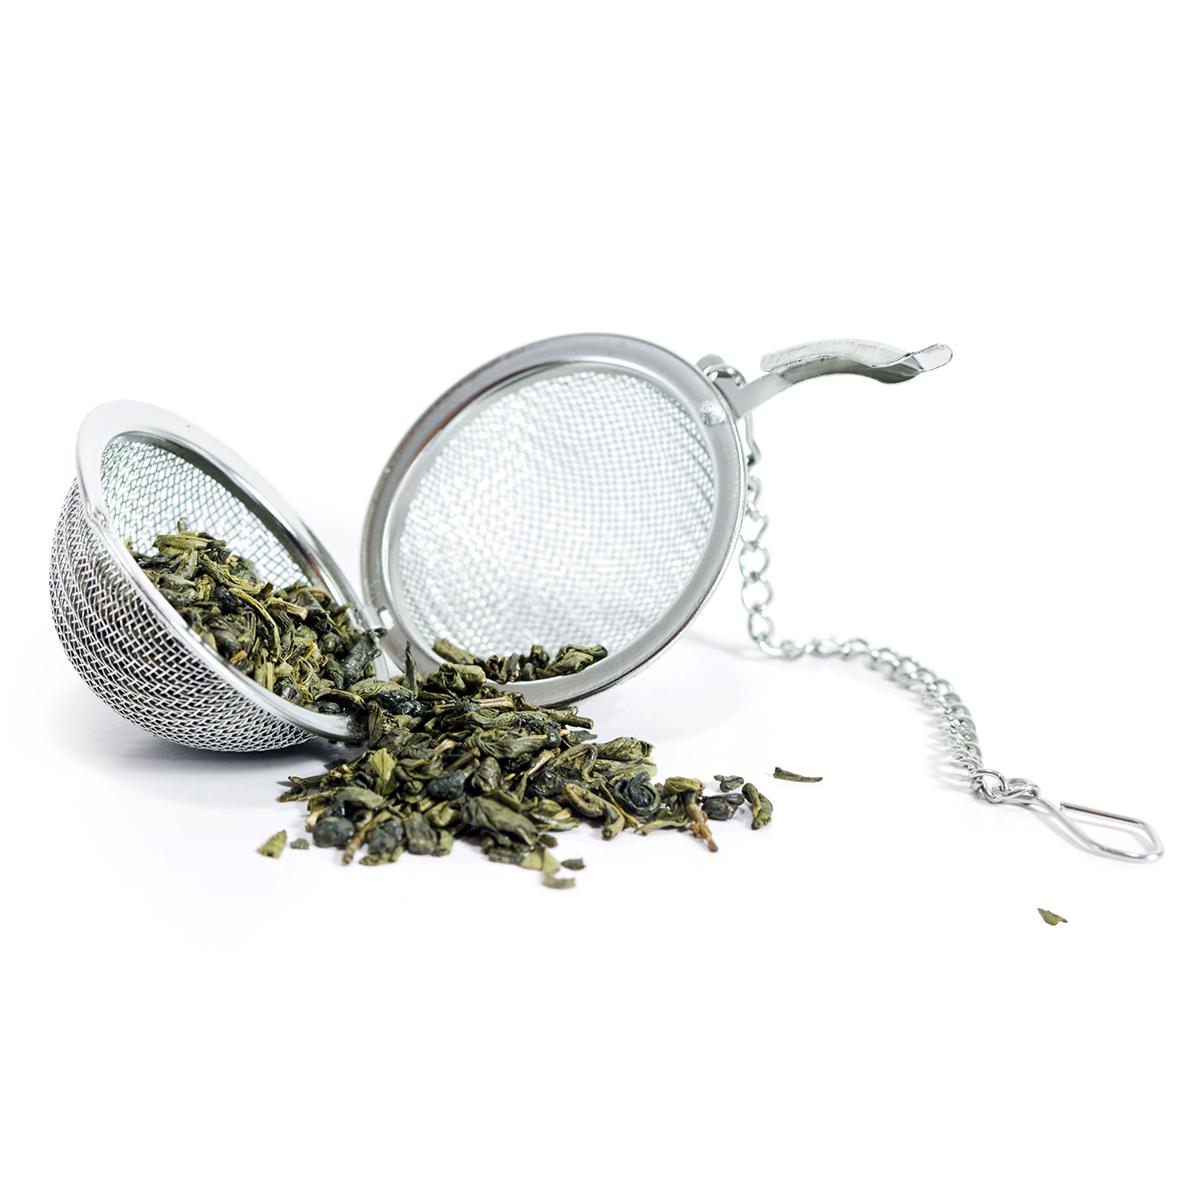 the green stuff tea leaves